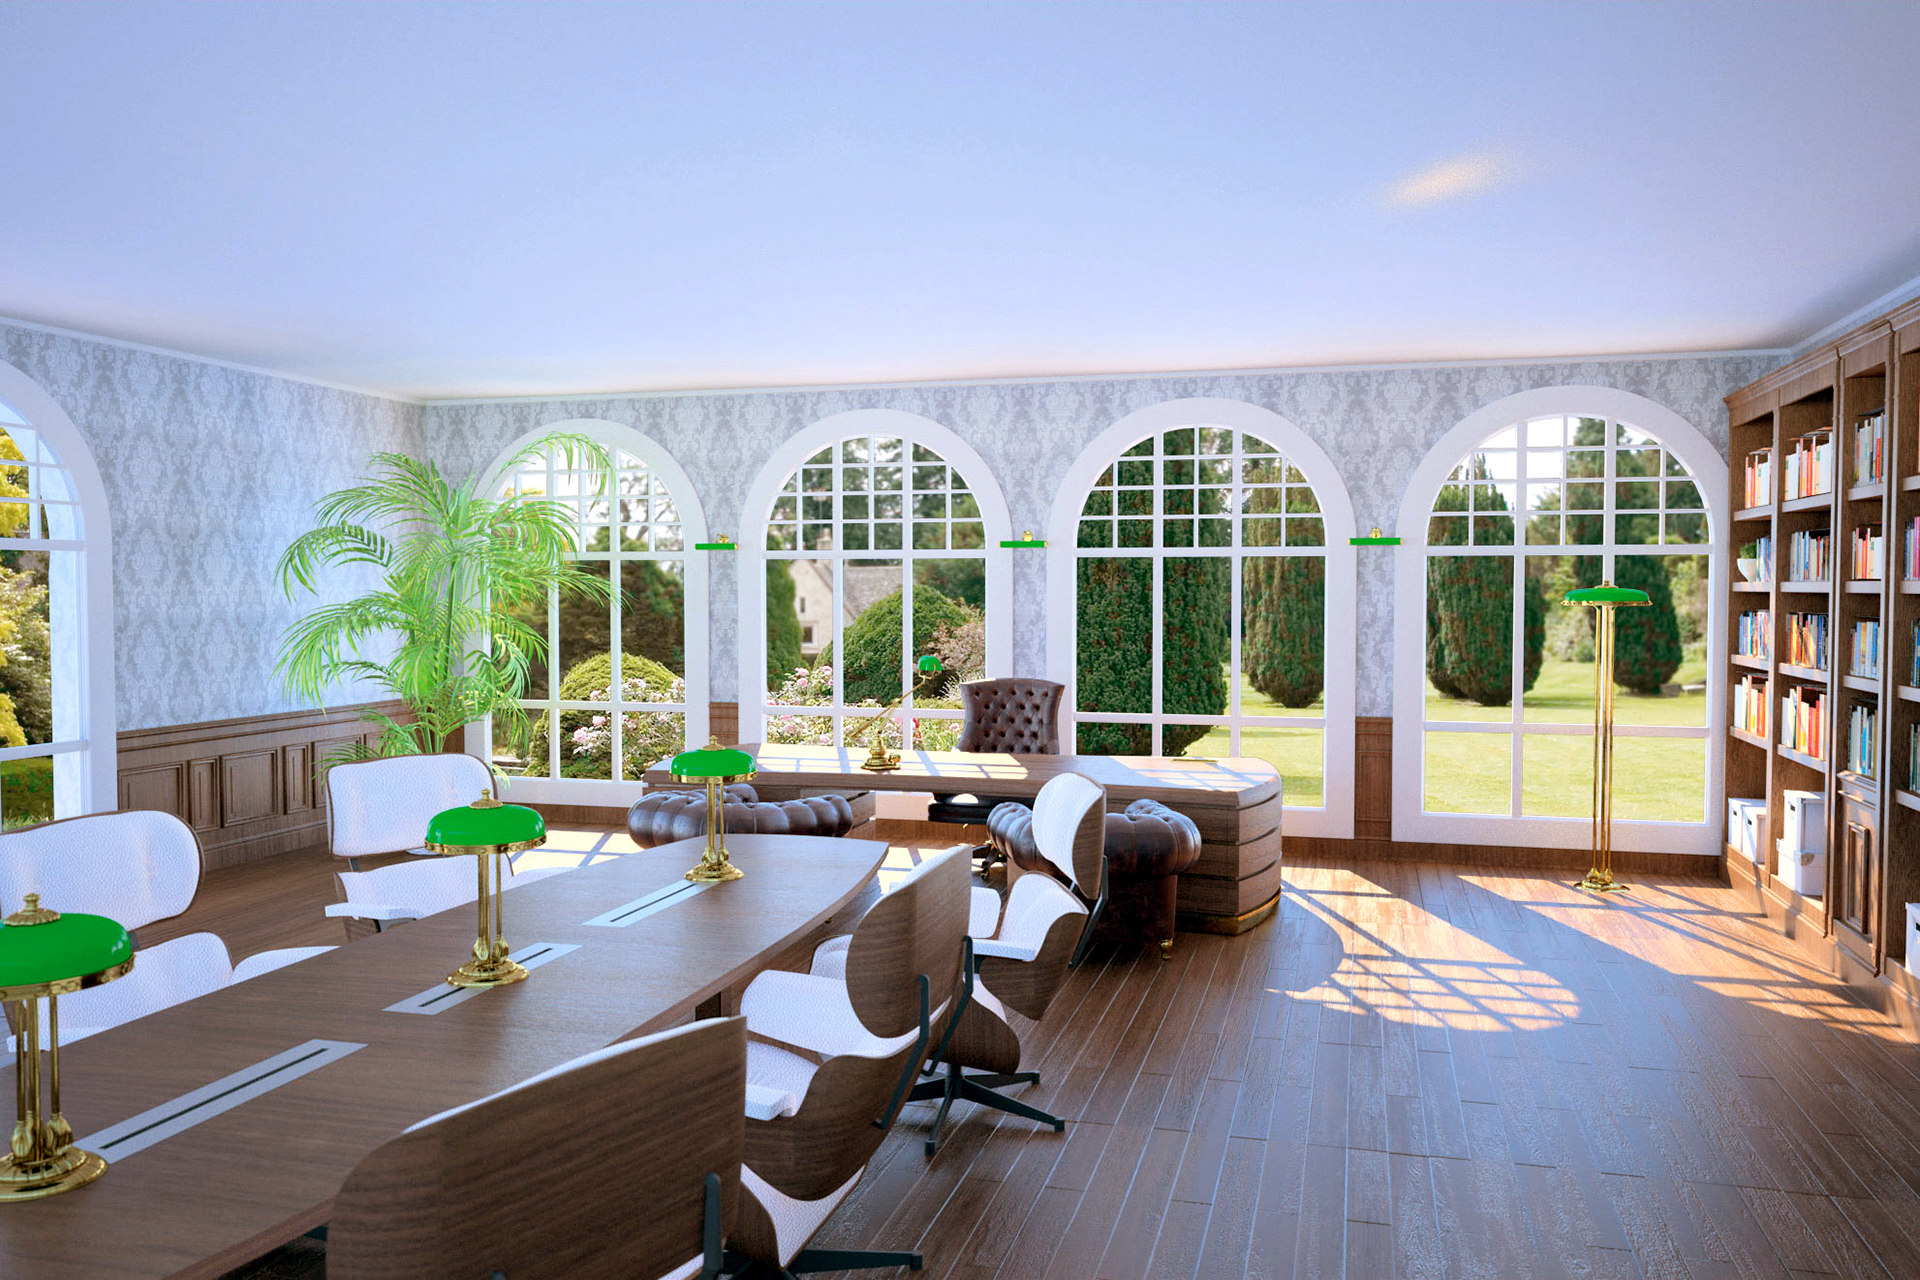 riunioni-1_architecture_styling_arch-style